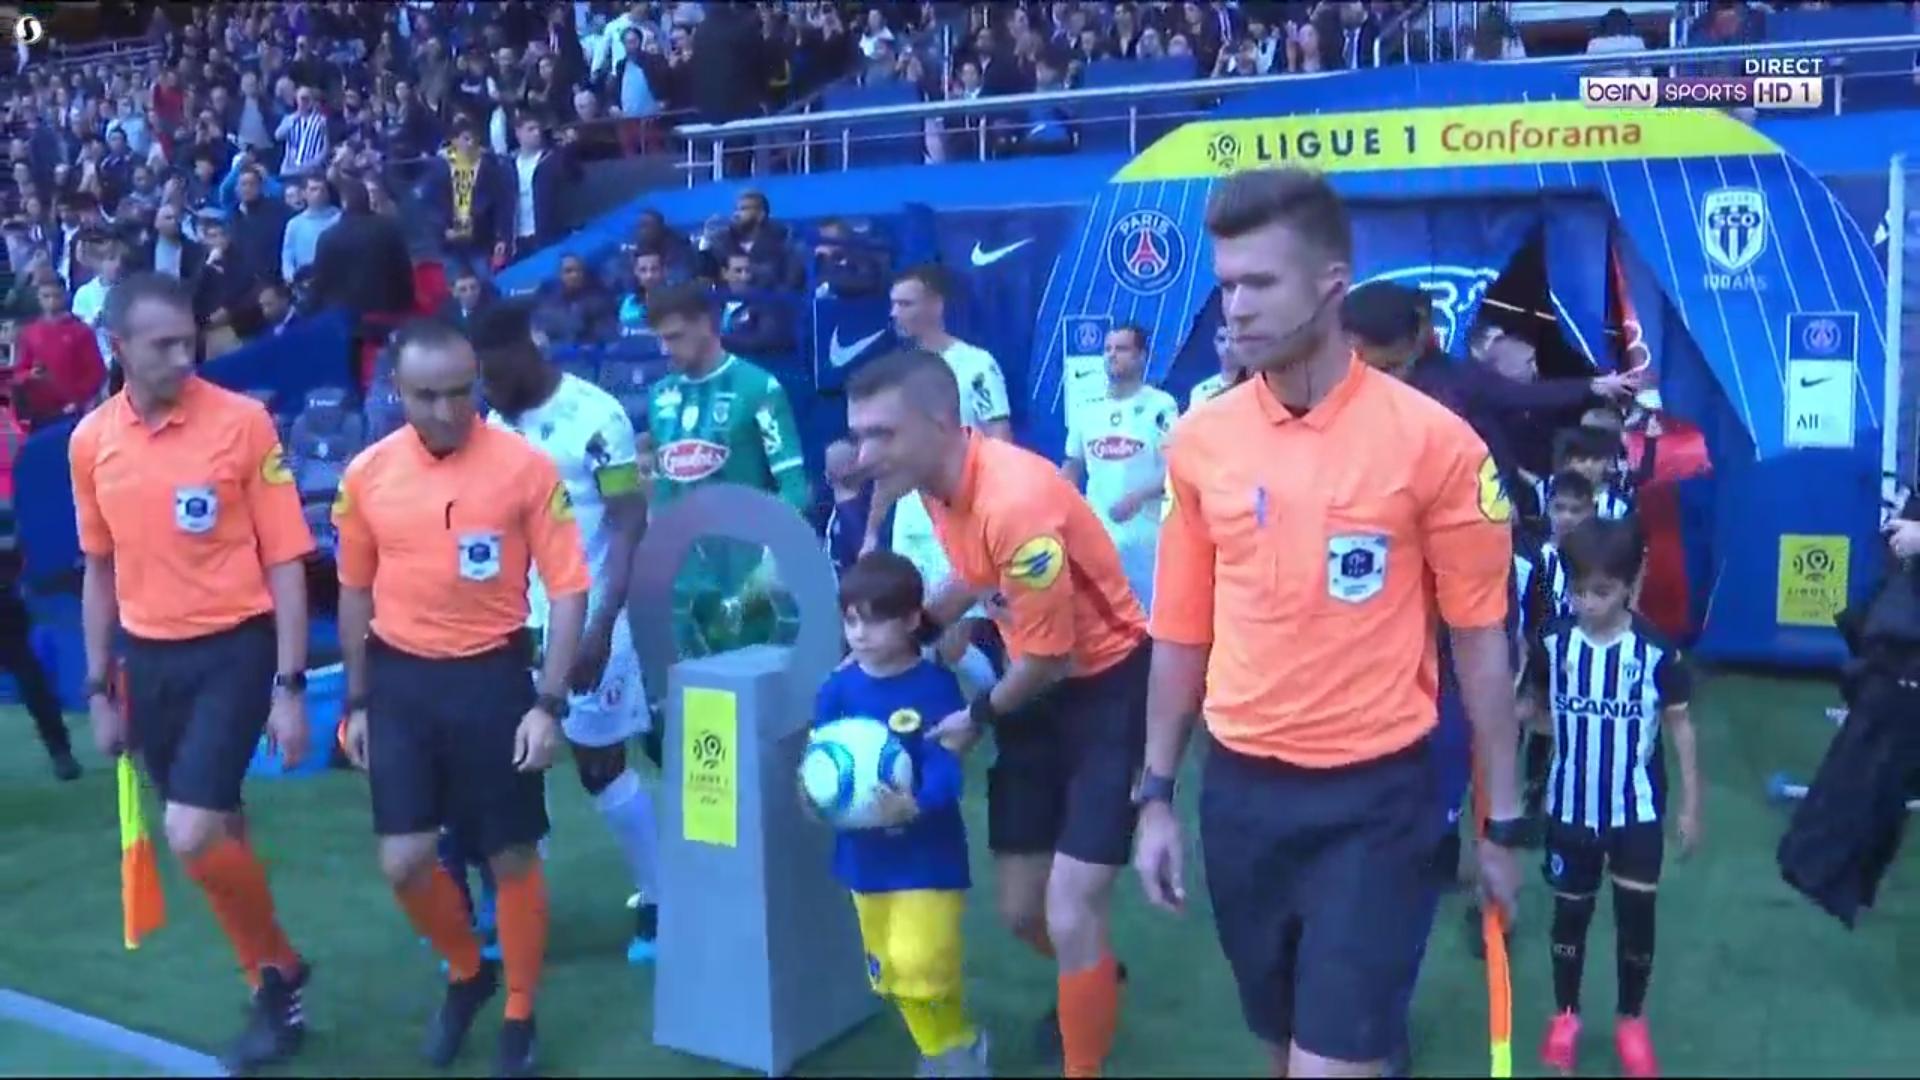 05-10-2019 - Paris Saint-Germain 4-0 Angers